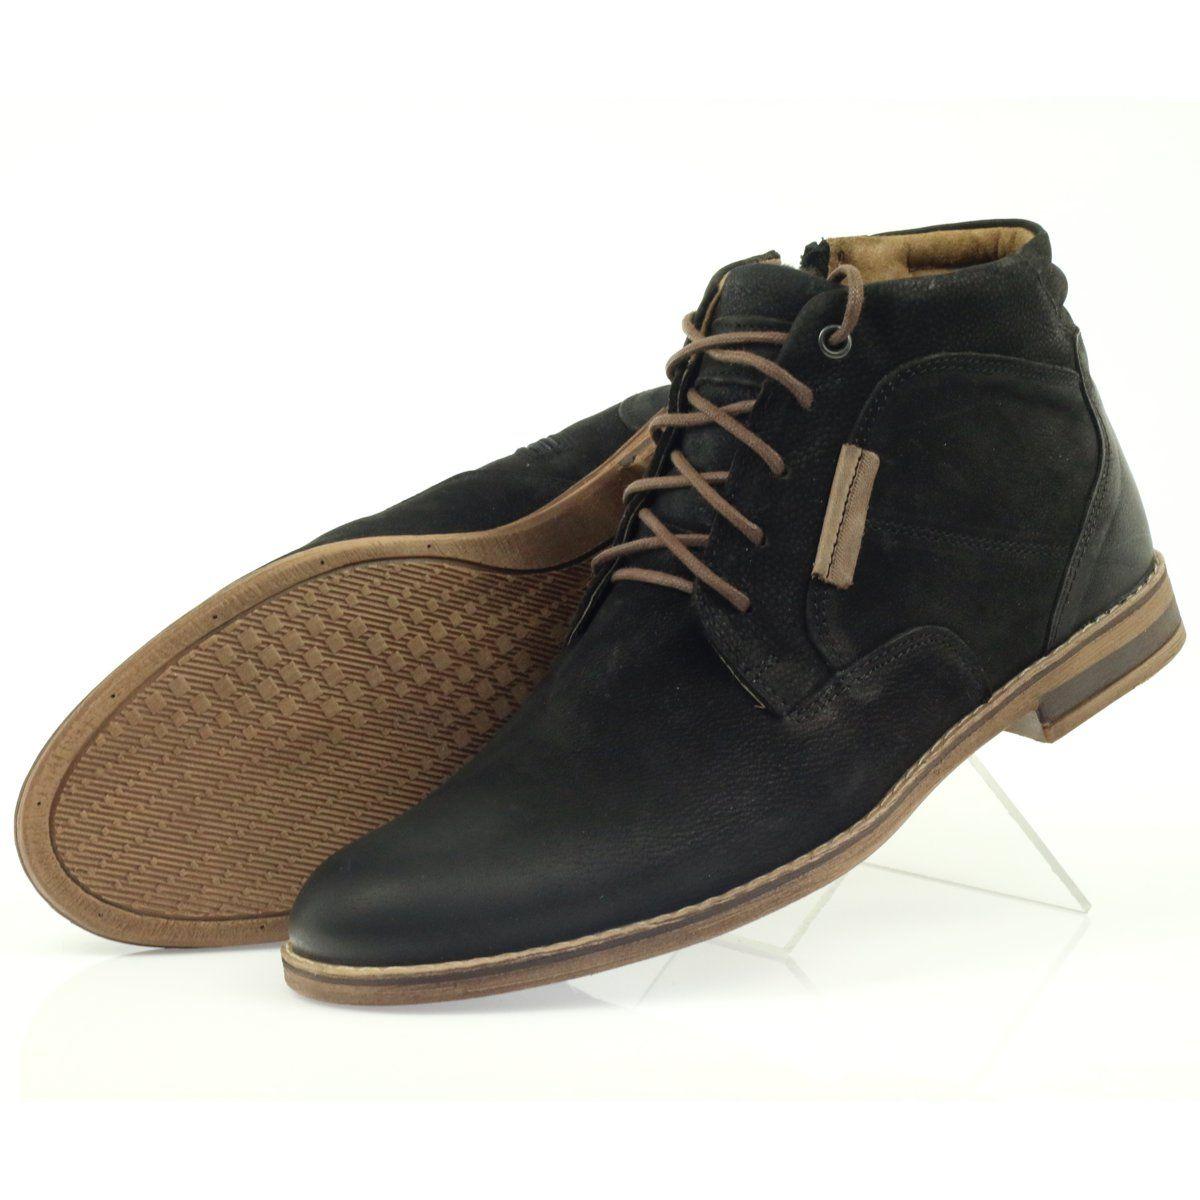 Riko Botki Sztyblety Buty Meskie Na Suwak Czarne Boots Chukka Boots Shoes